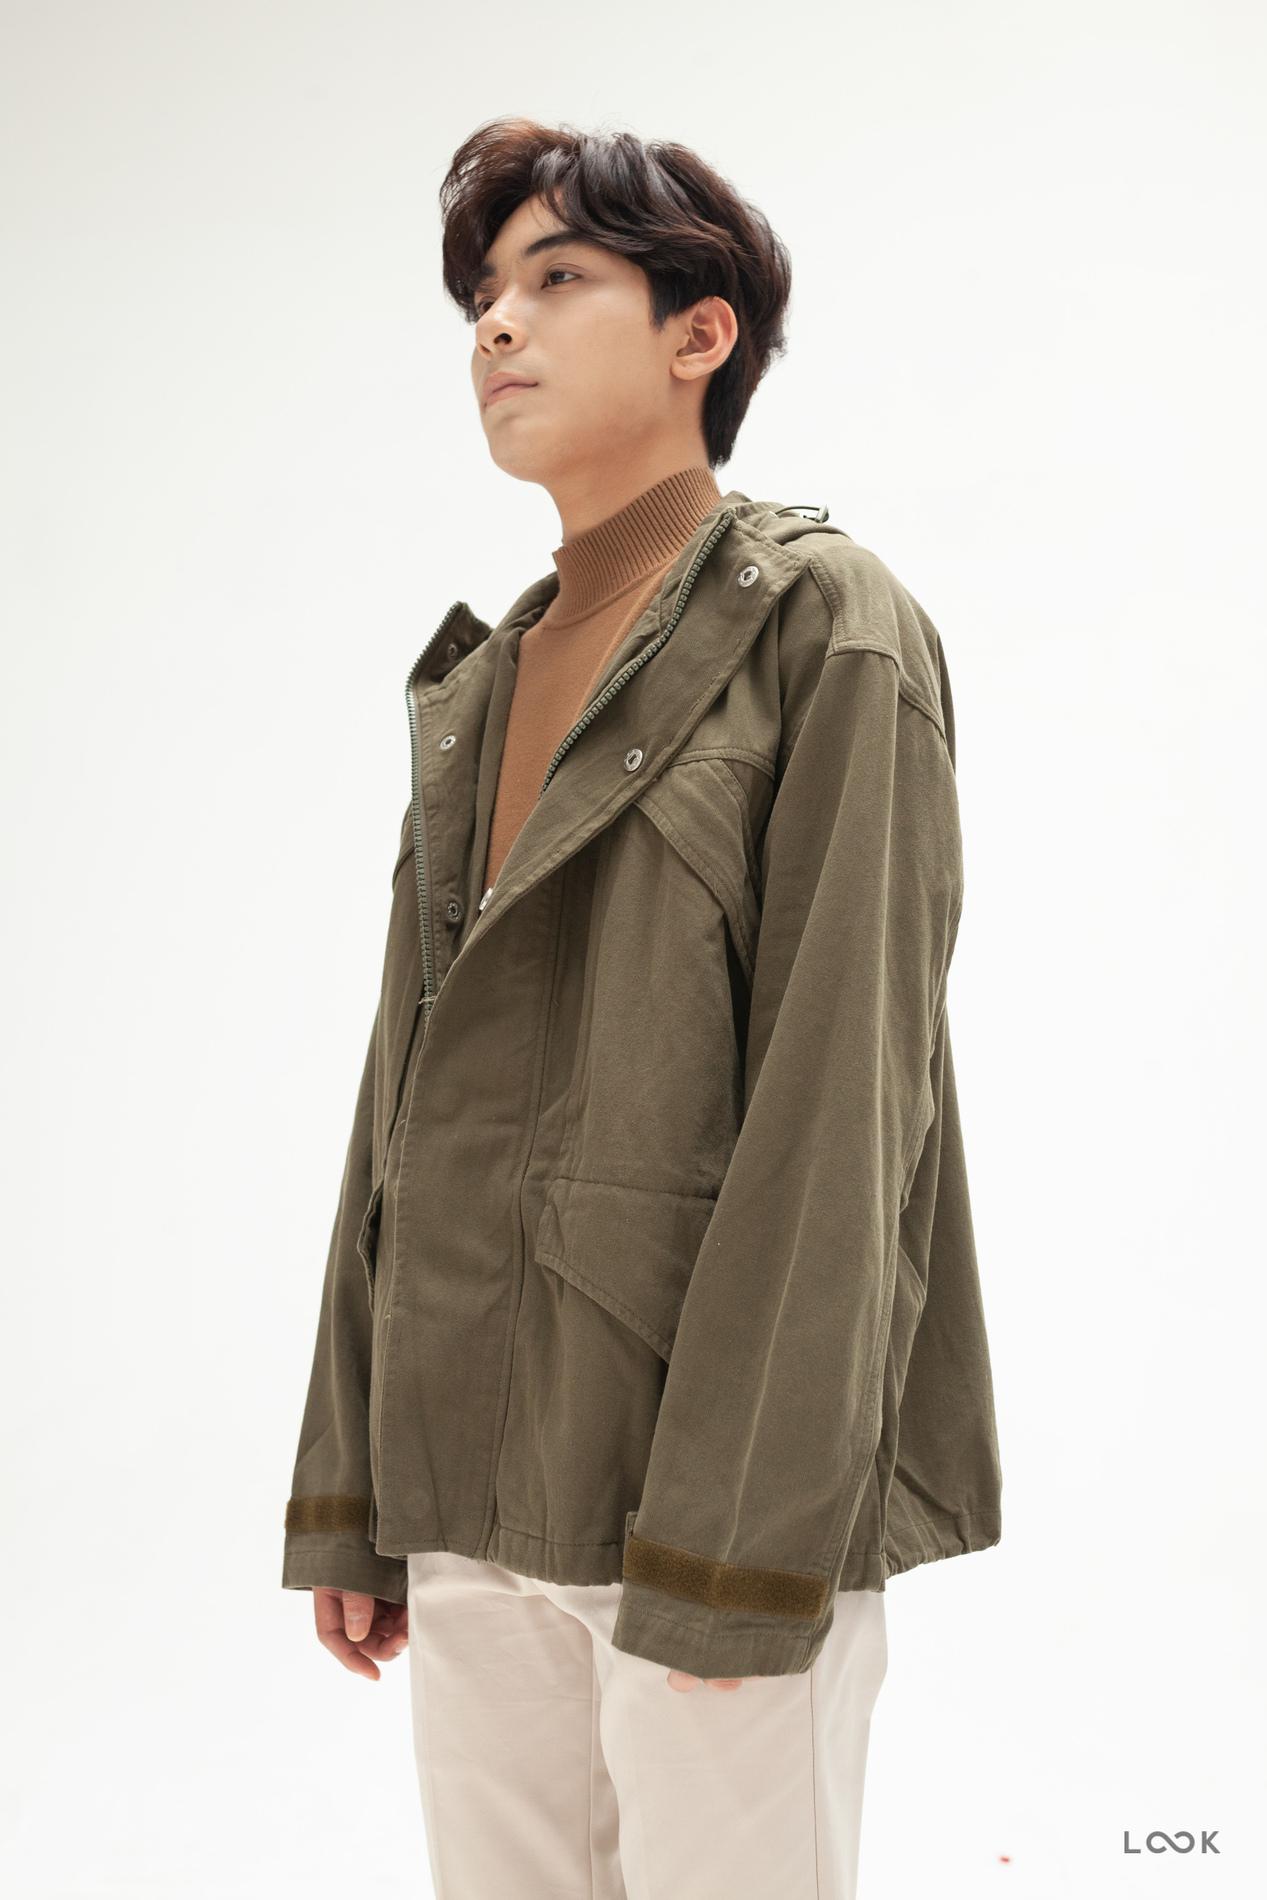 Look Army Jacket